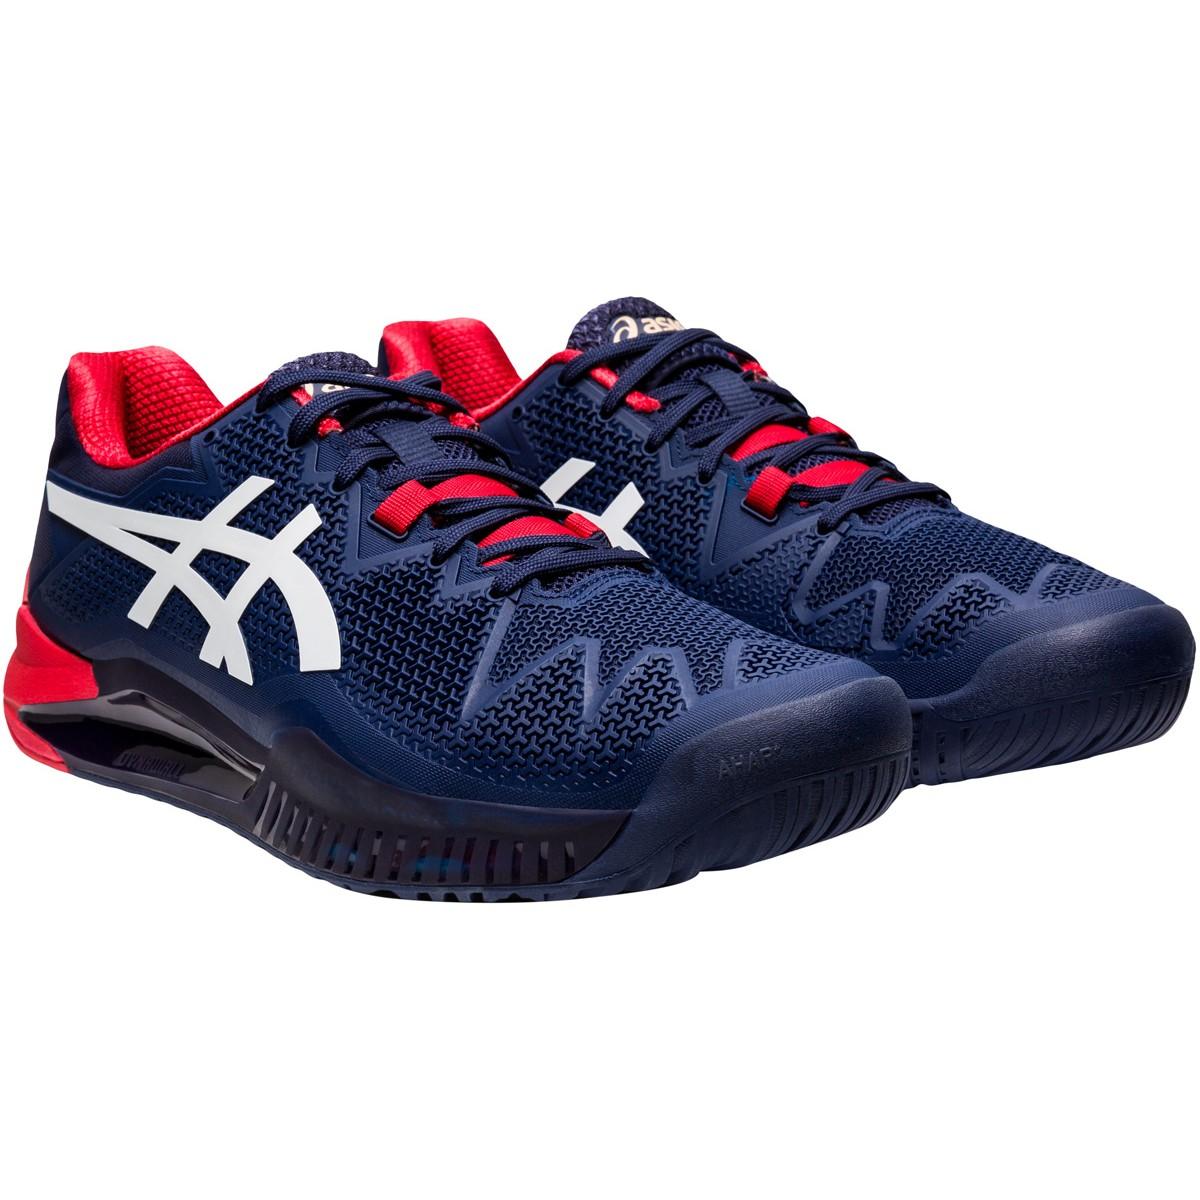 chaussures homme asics gel resolution 8